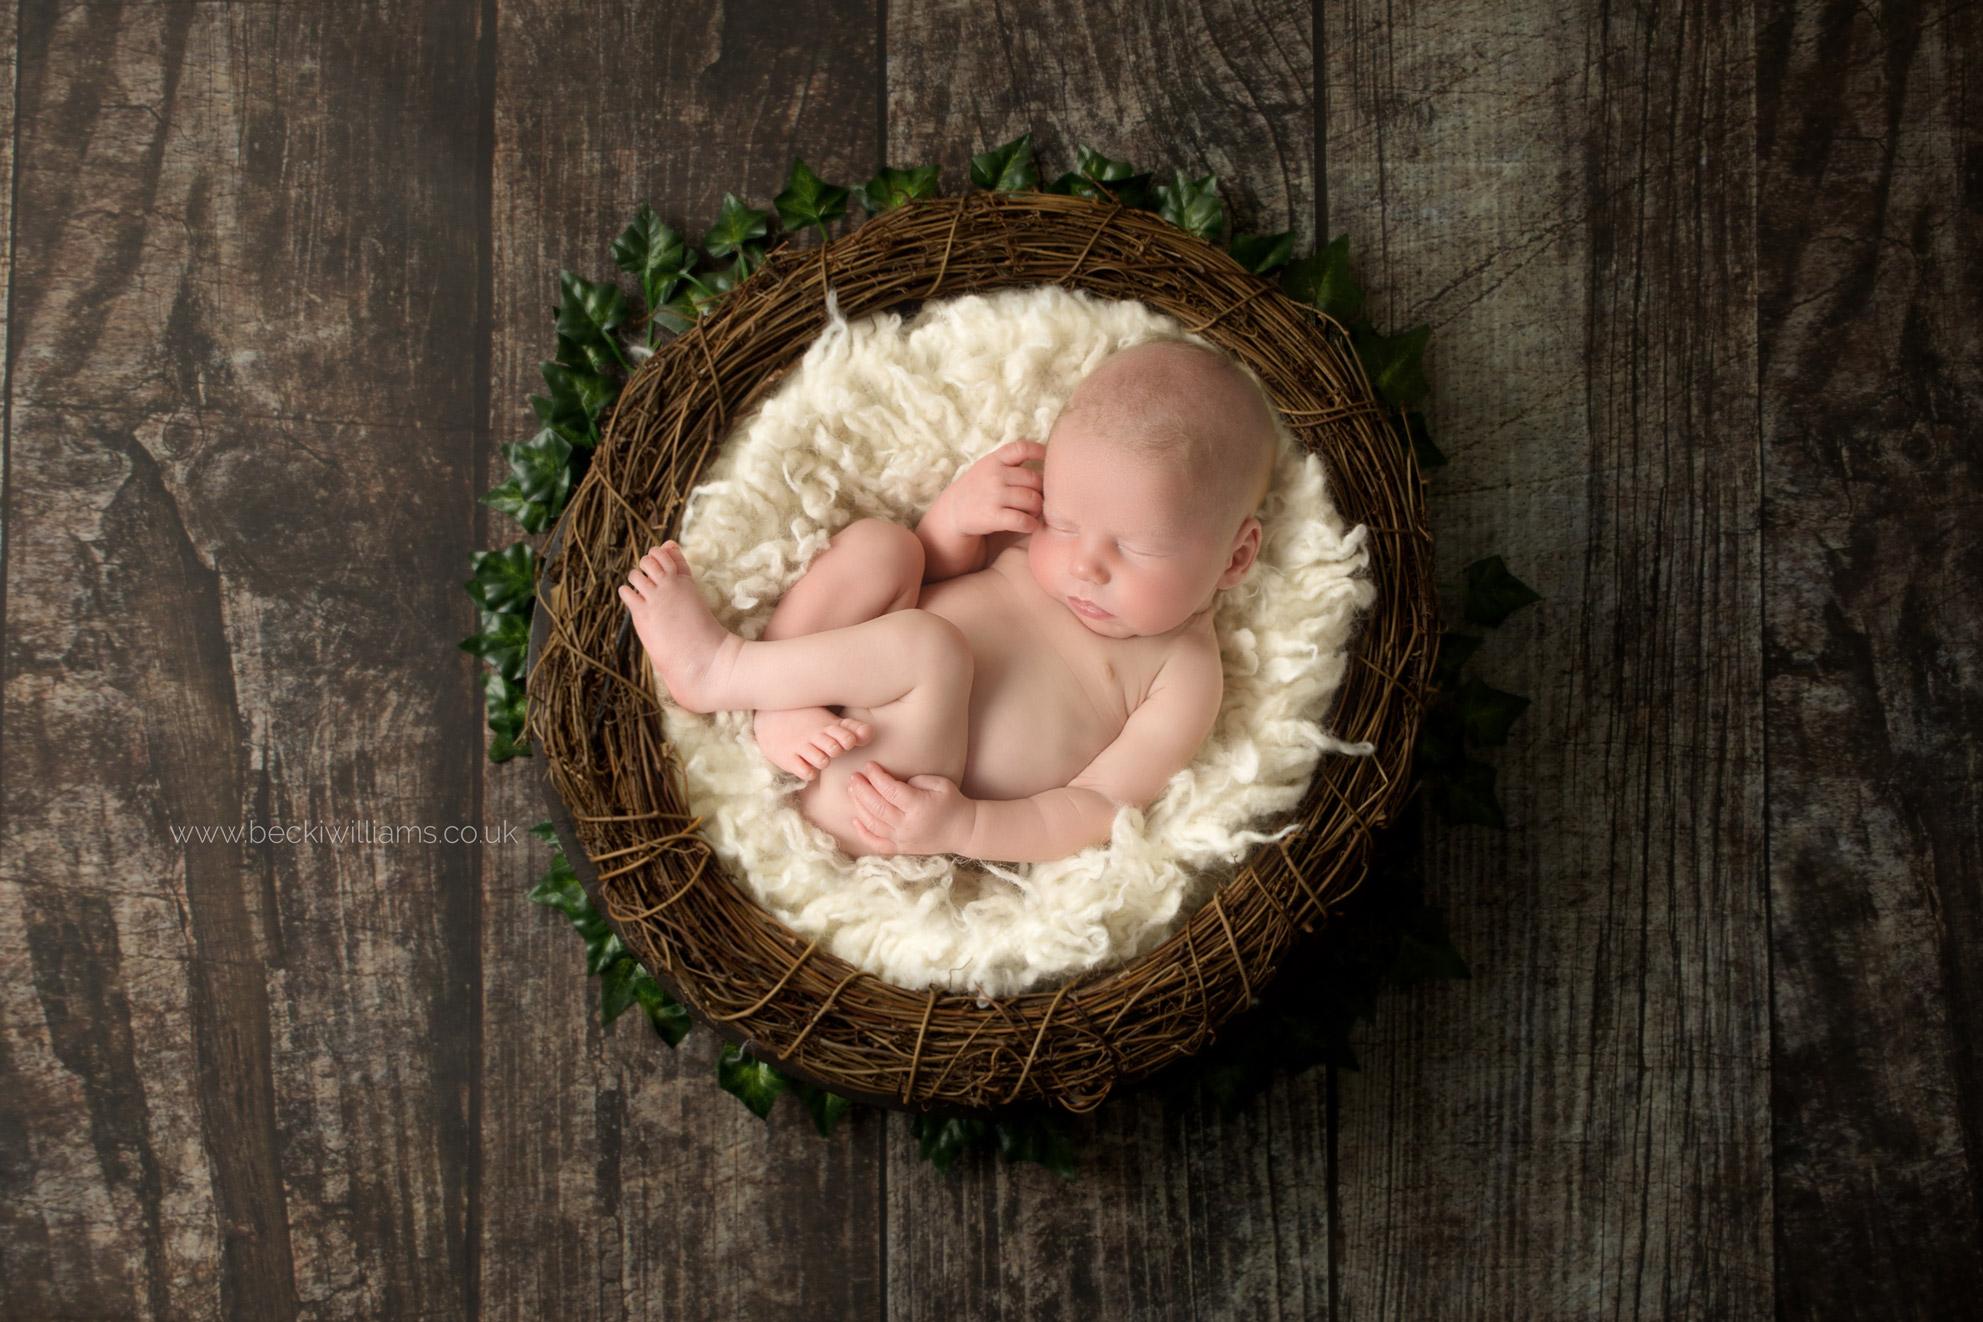 newborn-photography-berkhamsted-nature-leaves.jpg